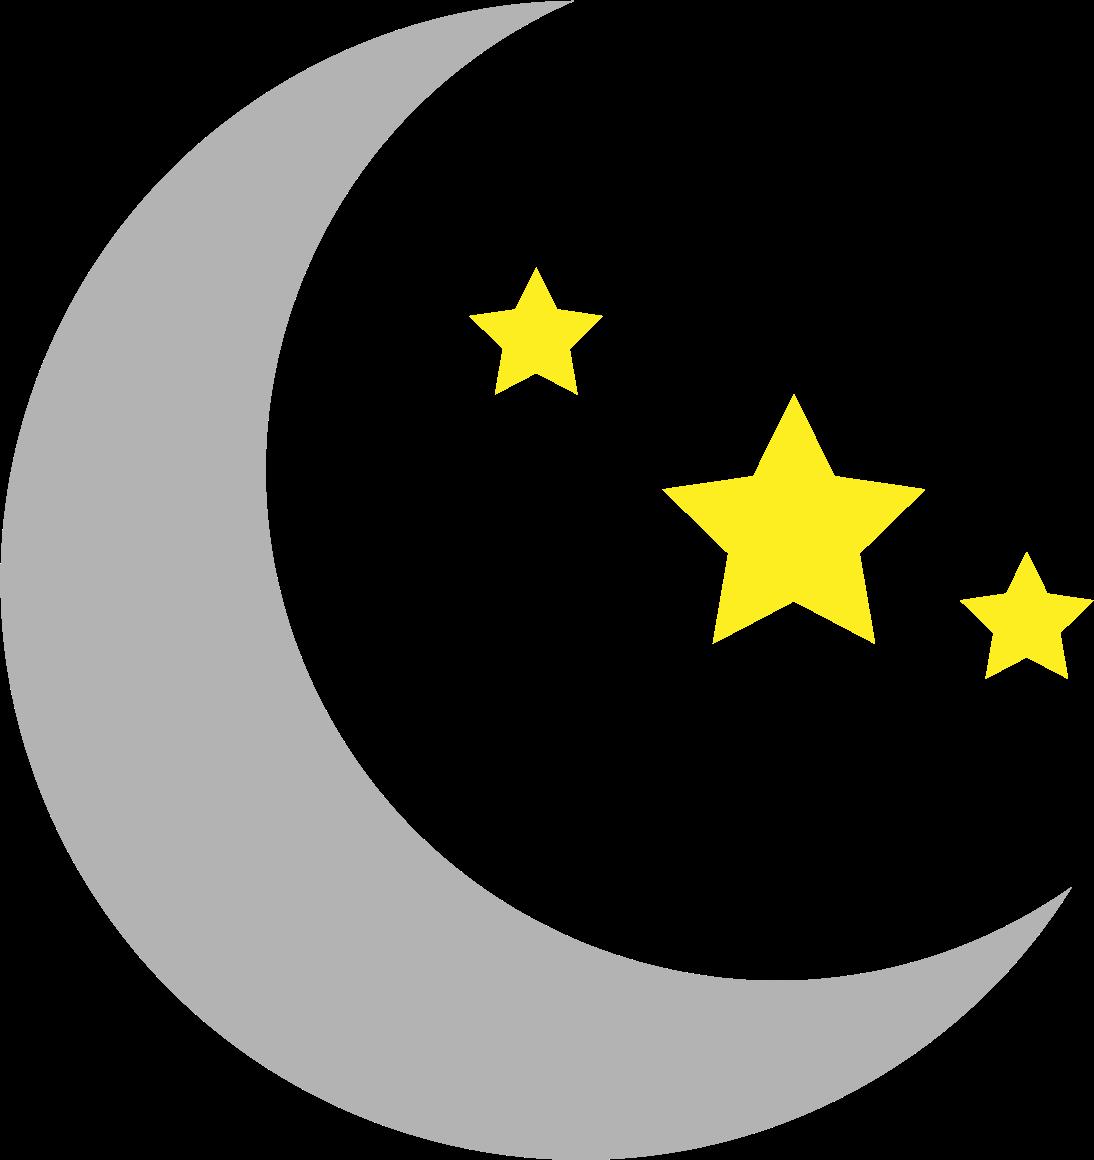 1094x1160 Moon And Stars Clipart Many Interesting Cliparts